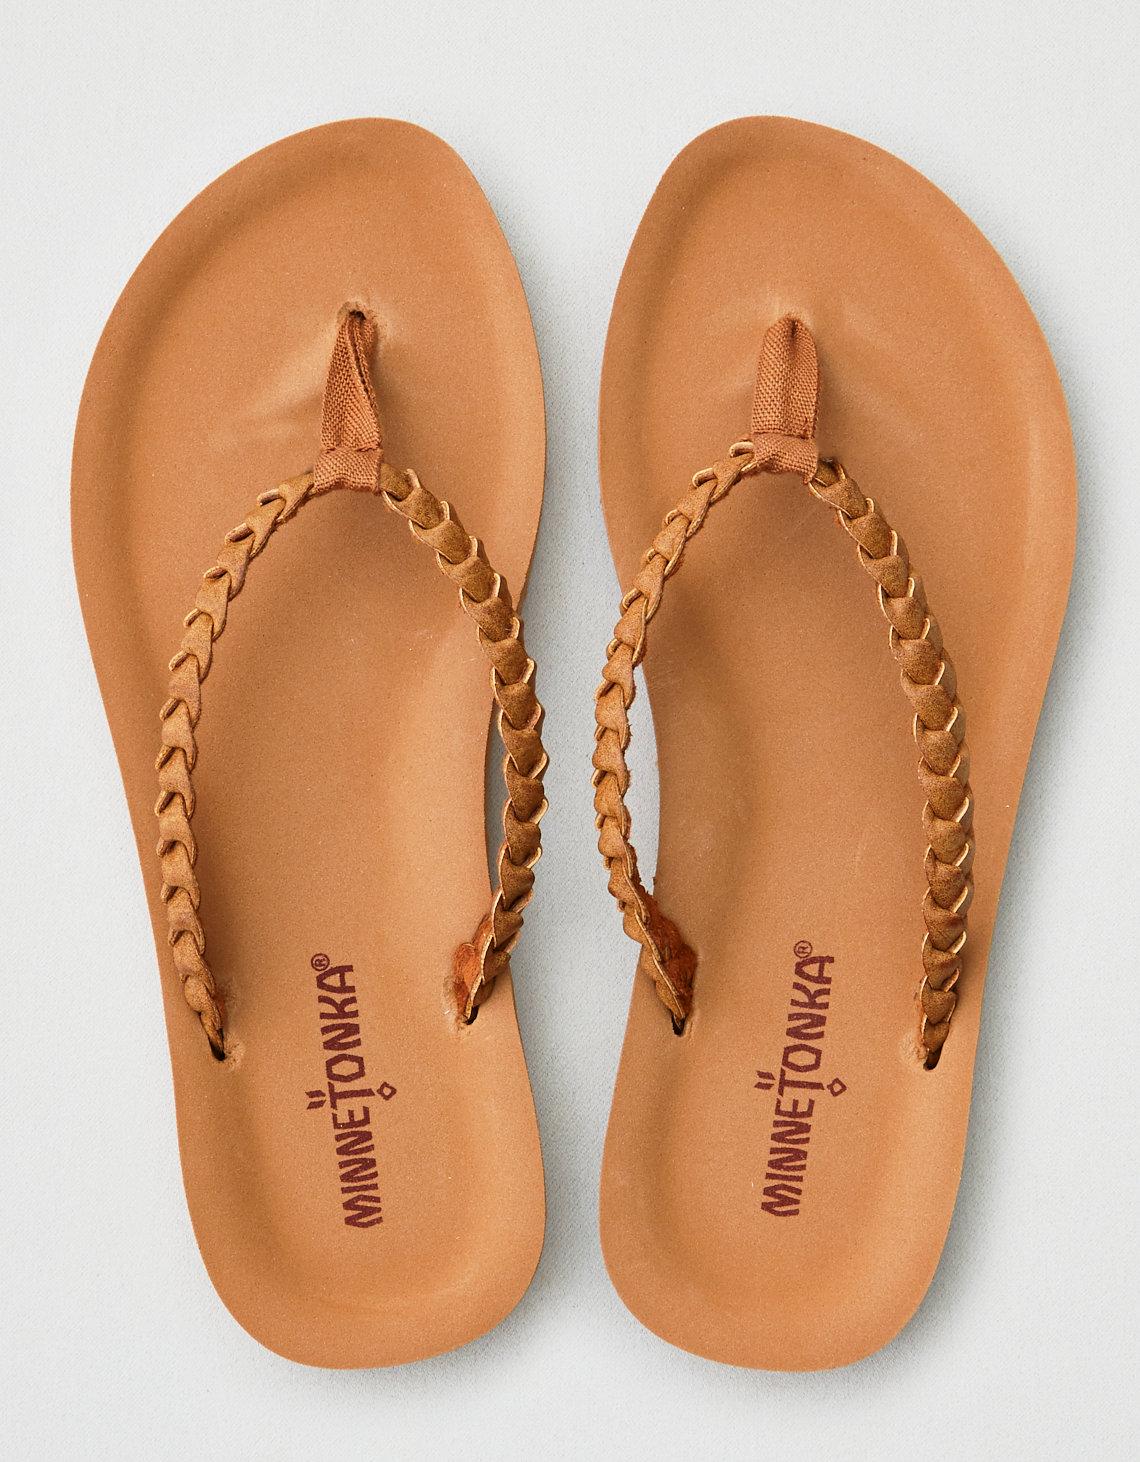 8ccc60ab6 Minnetonka Hallie Flip-Flop